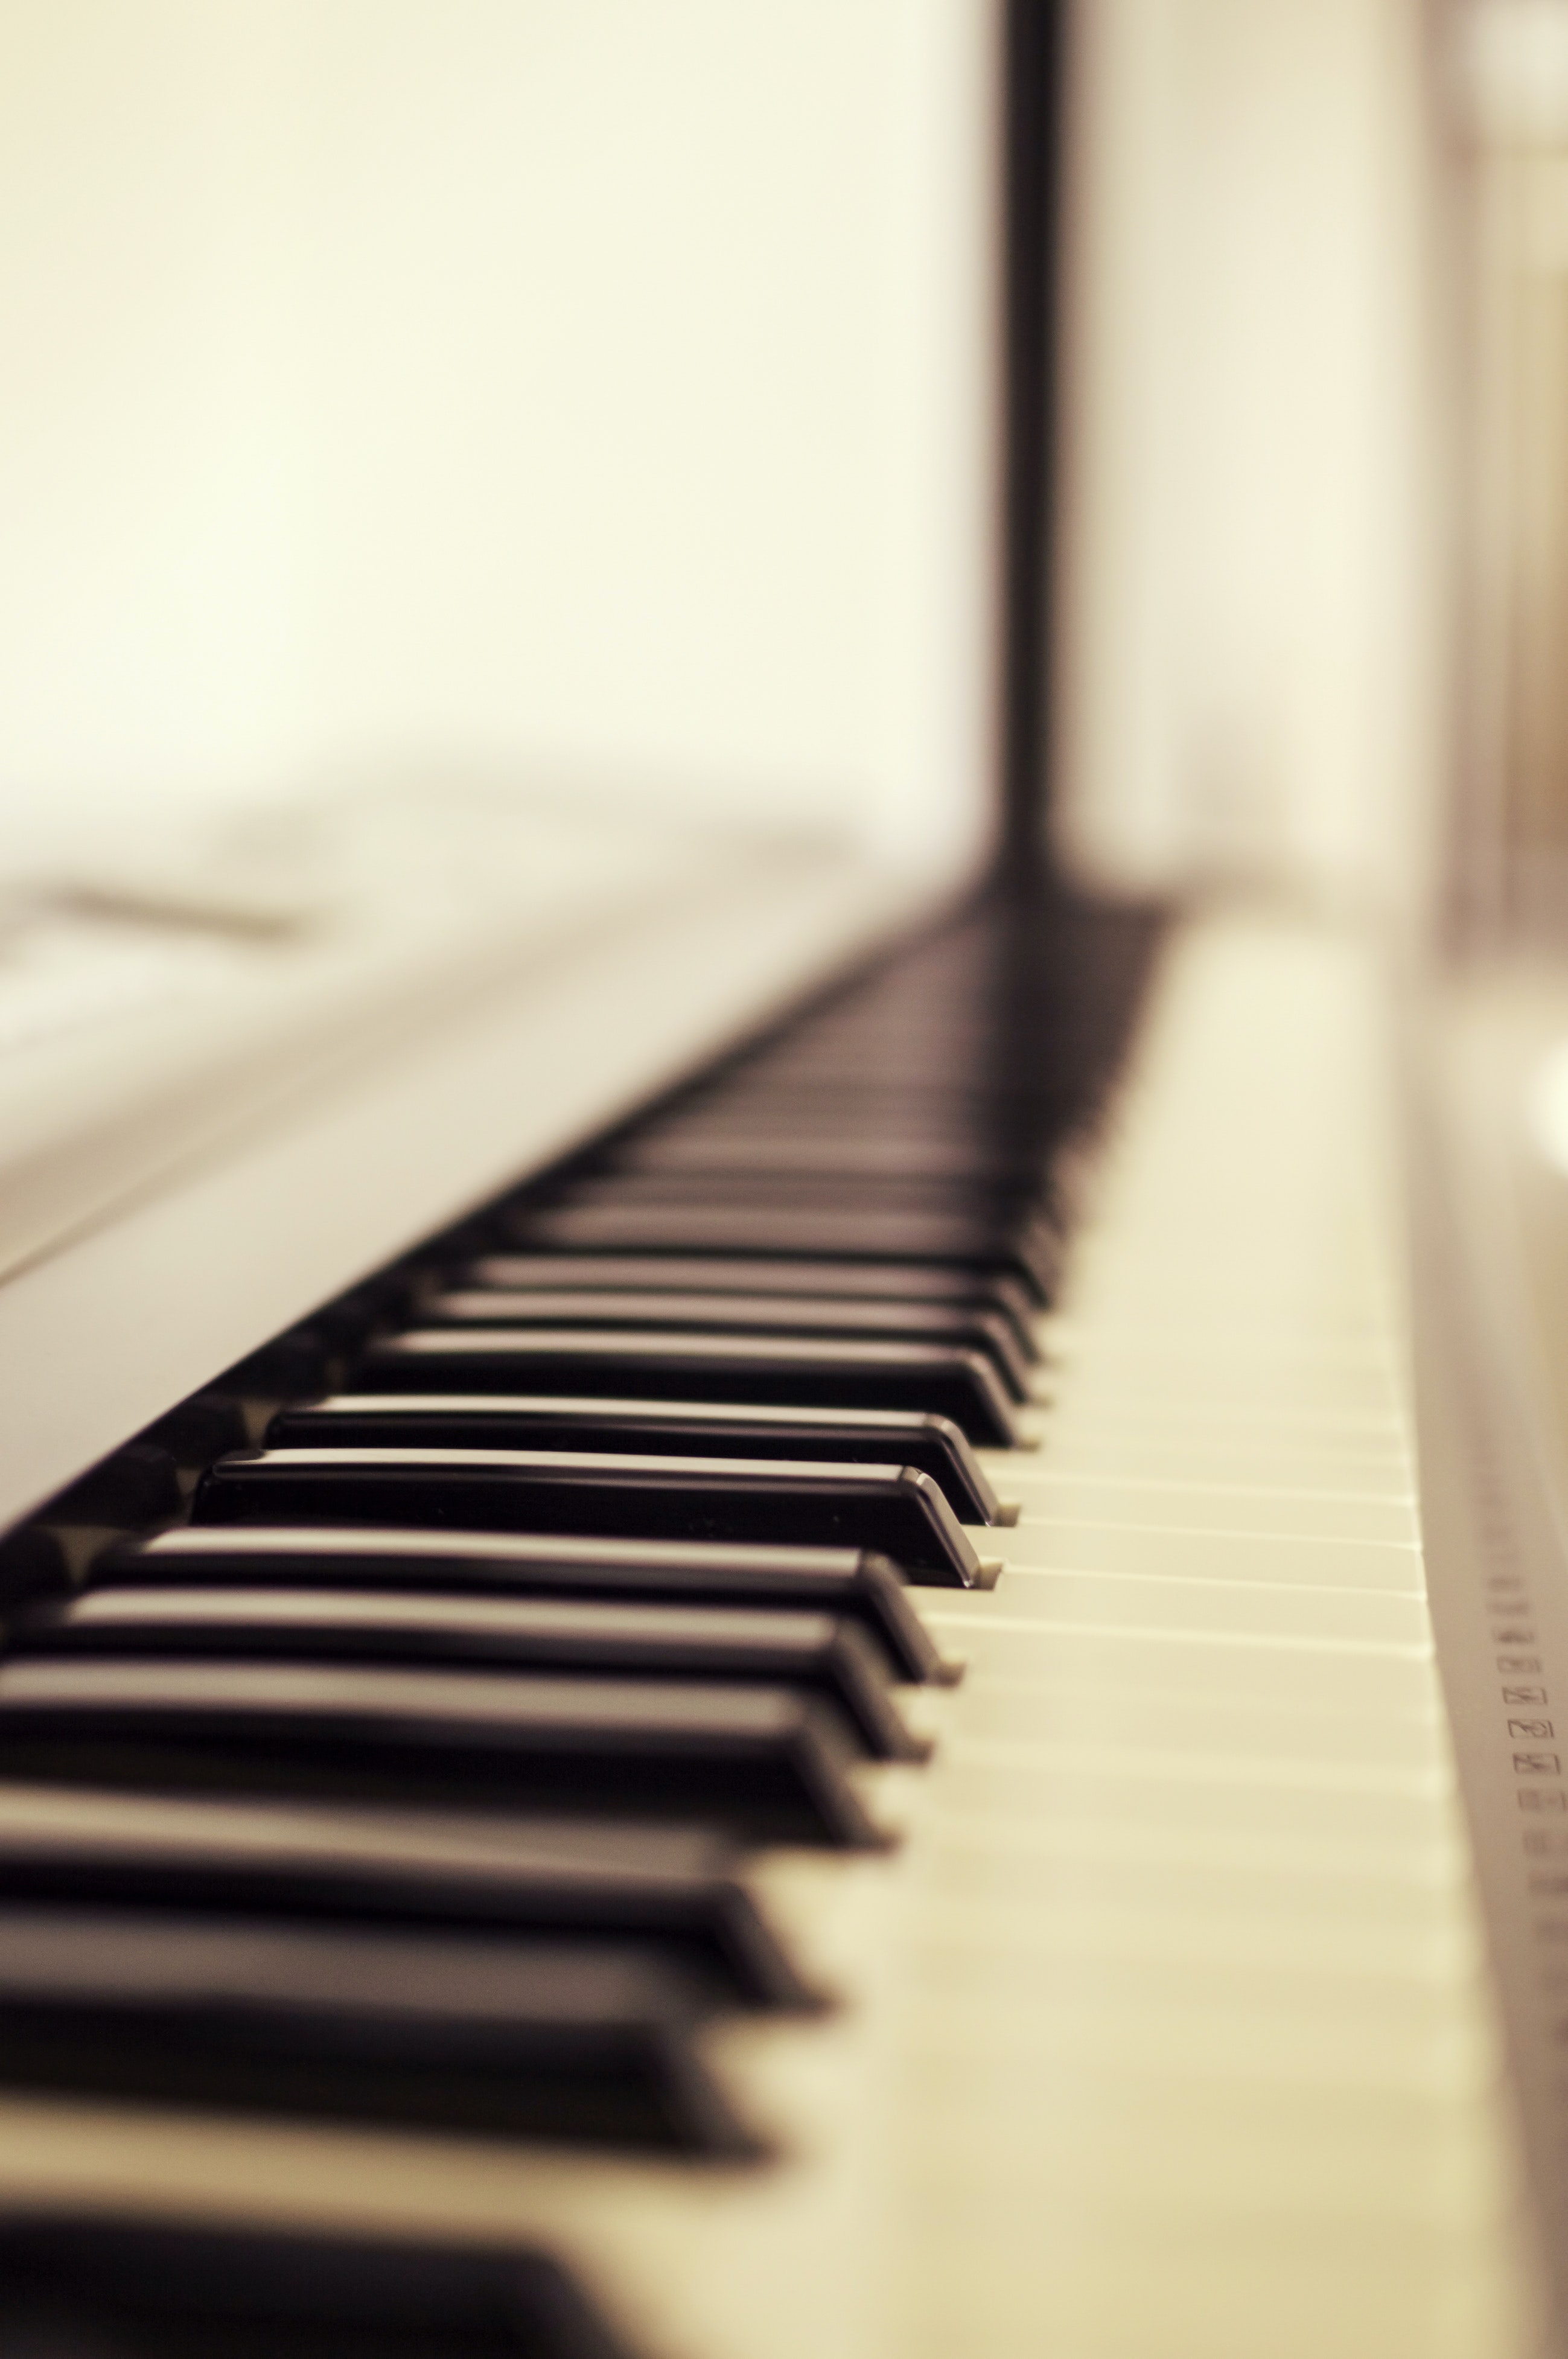 Piano full hd hdtv fhd p wallpapers hd desktop backgrounds